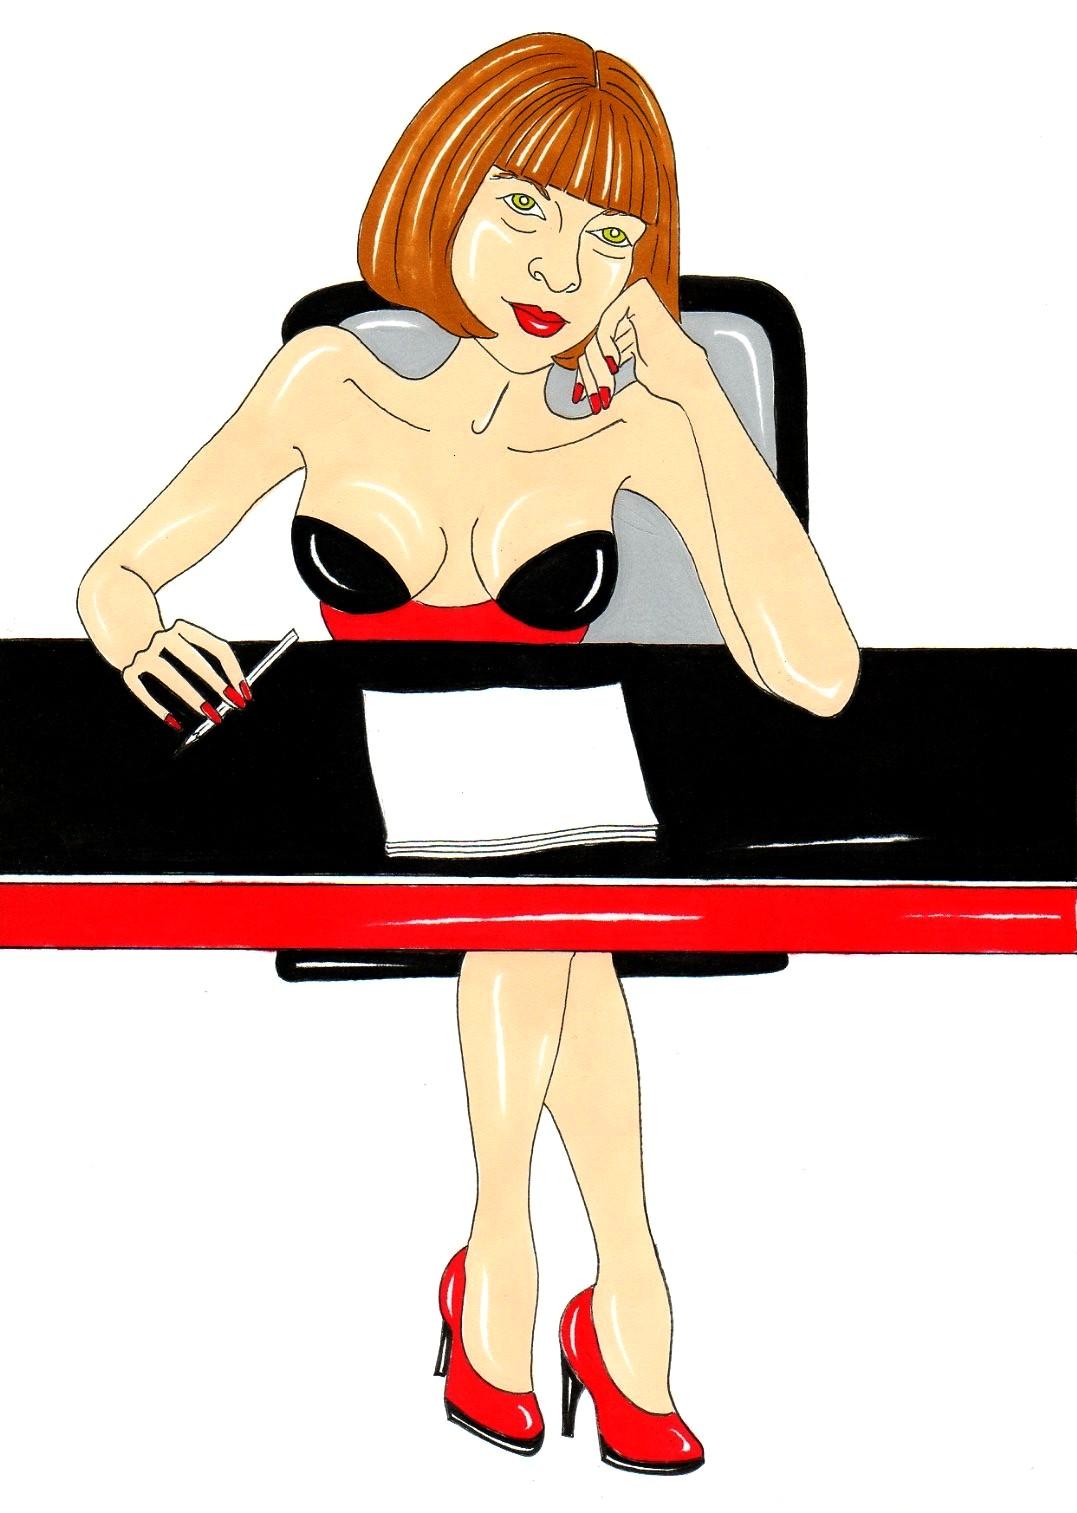 http://1.bp.blogspot.com/-0IMV4lpT_R4/Tyr81mjLOOI/AAAAAAAADJ8/9BZfZ8tCF28/s1600/Anna+Wintour+exercisez+pre+NY+Fashion+Week++Humor+Chic+by+aleXsandro+Palombo+1.jpg